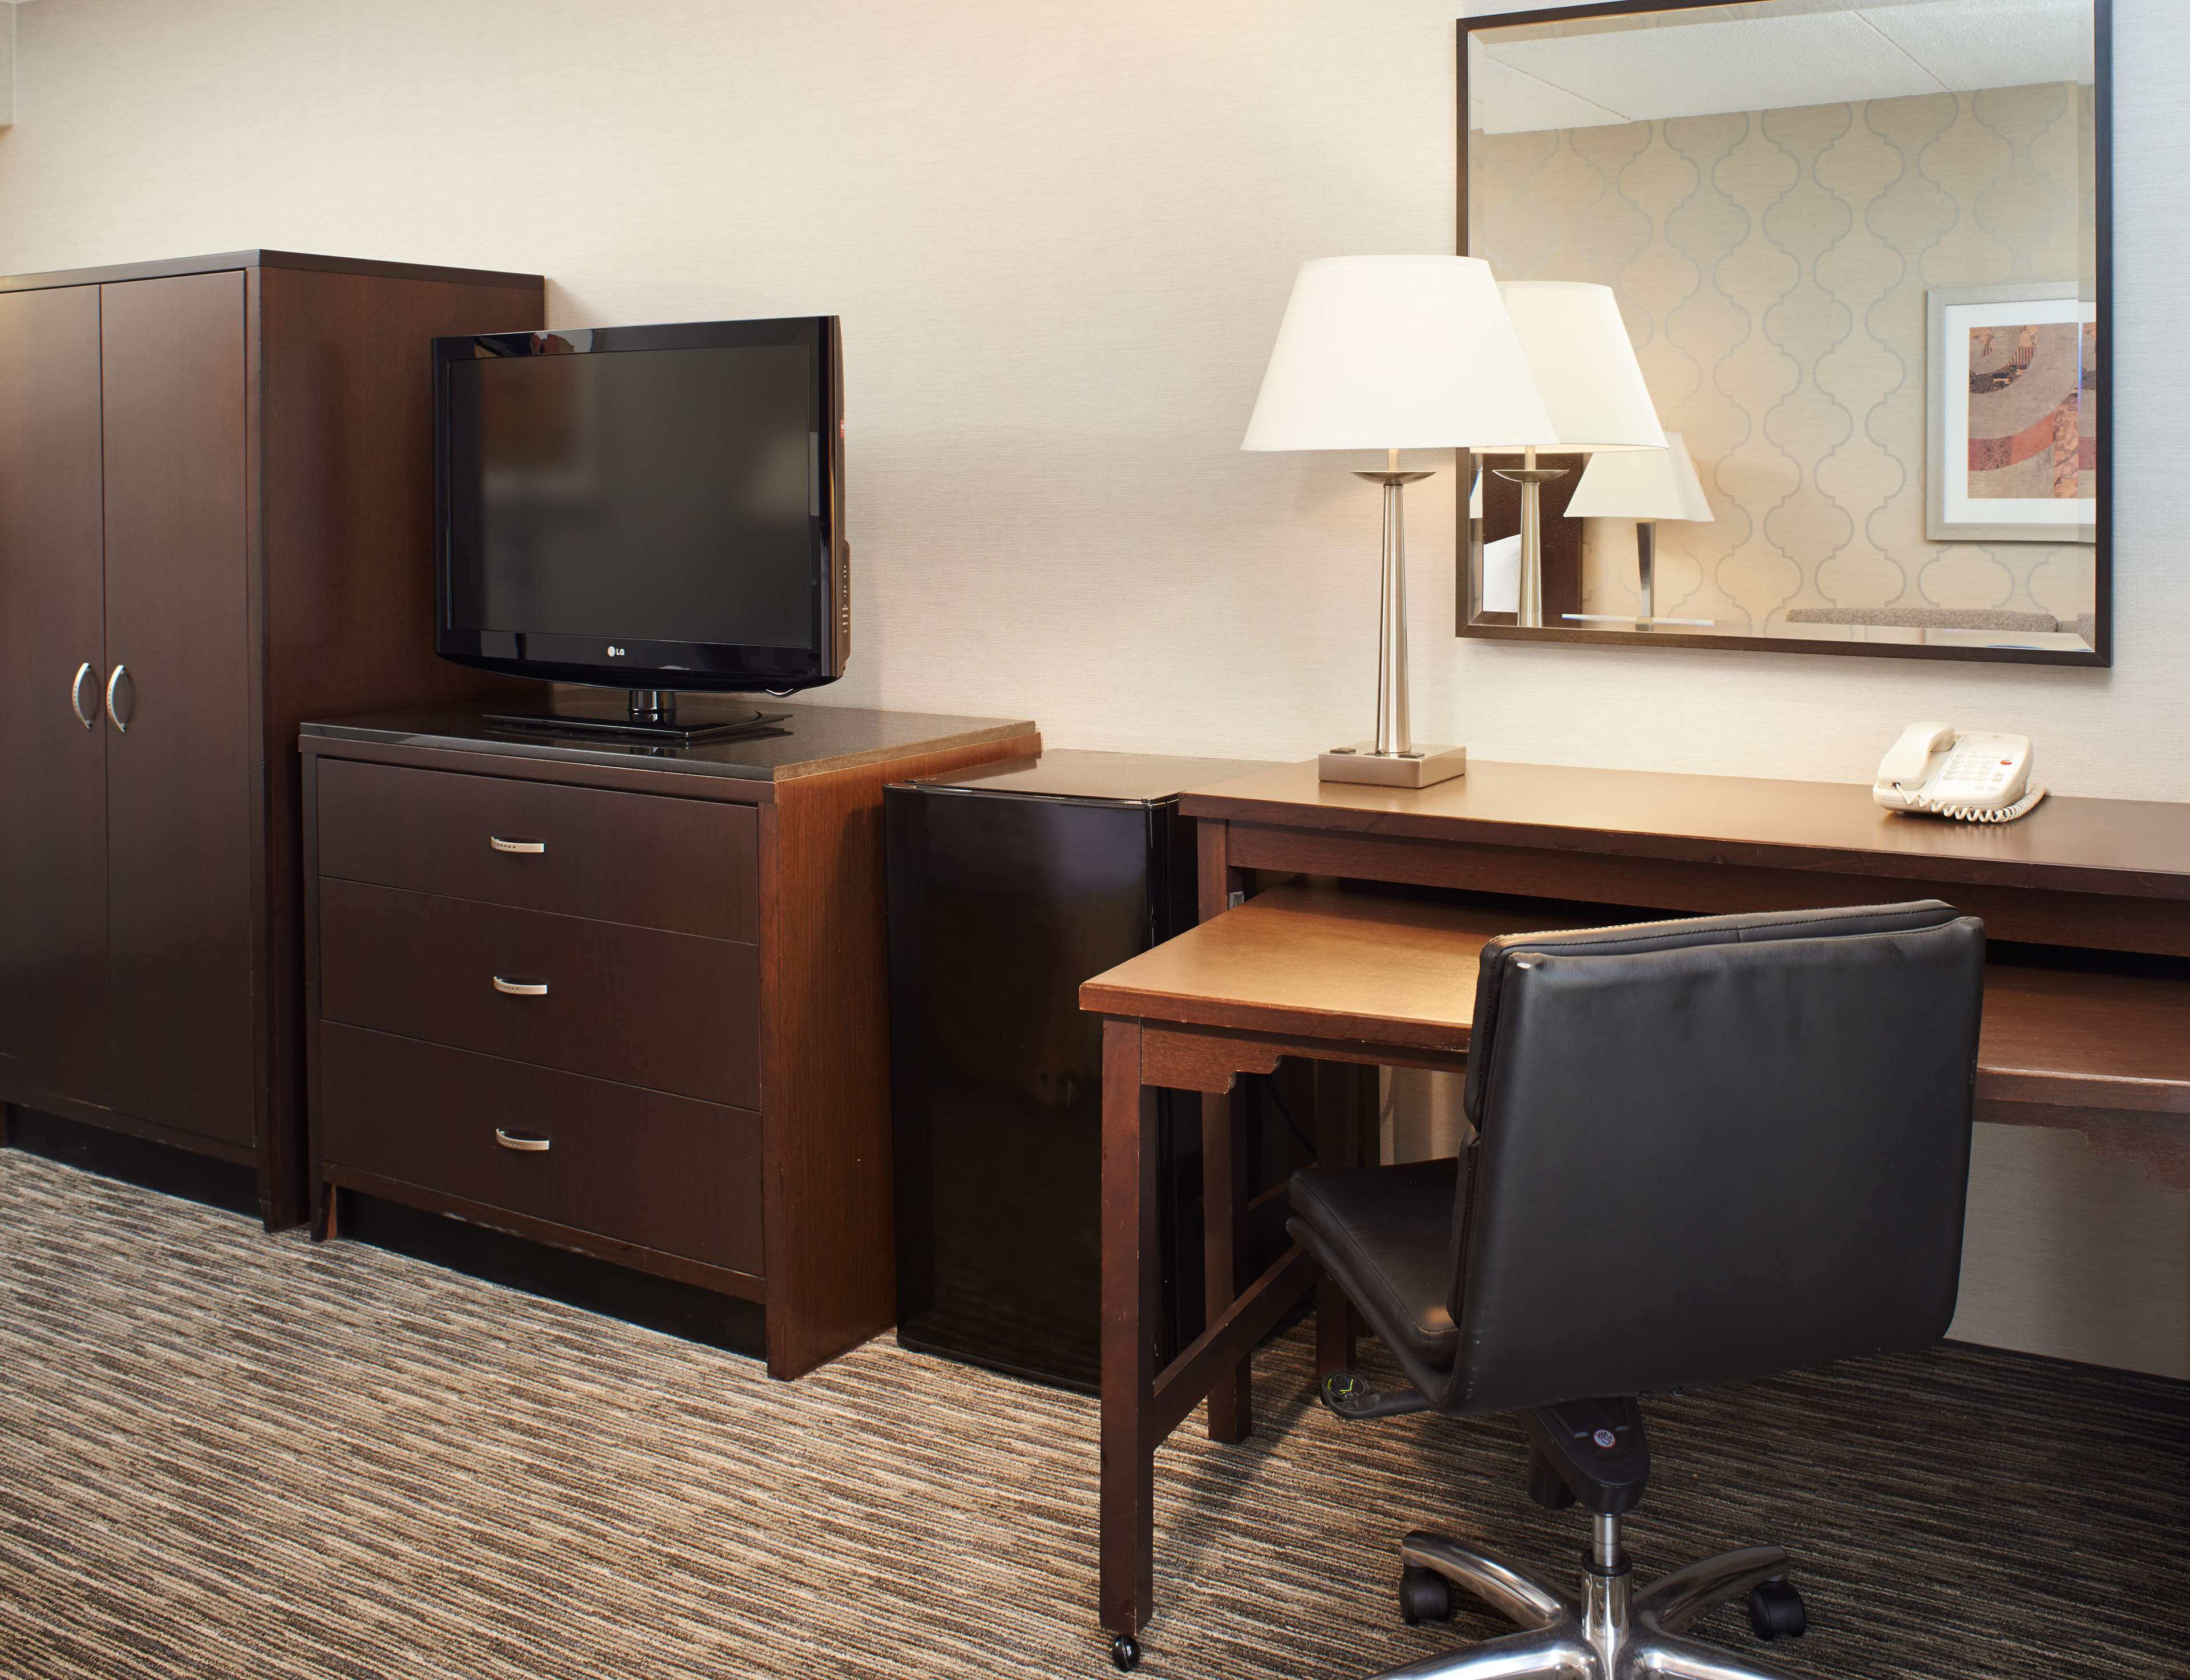 DoubleTree by Hilton Hotel Detroit - Dearborn image 15